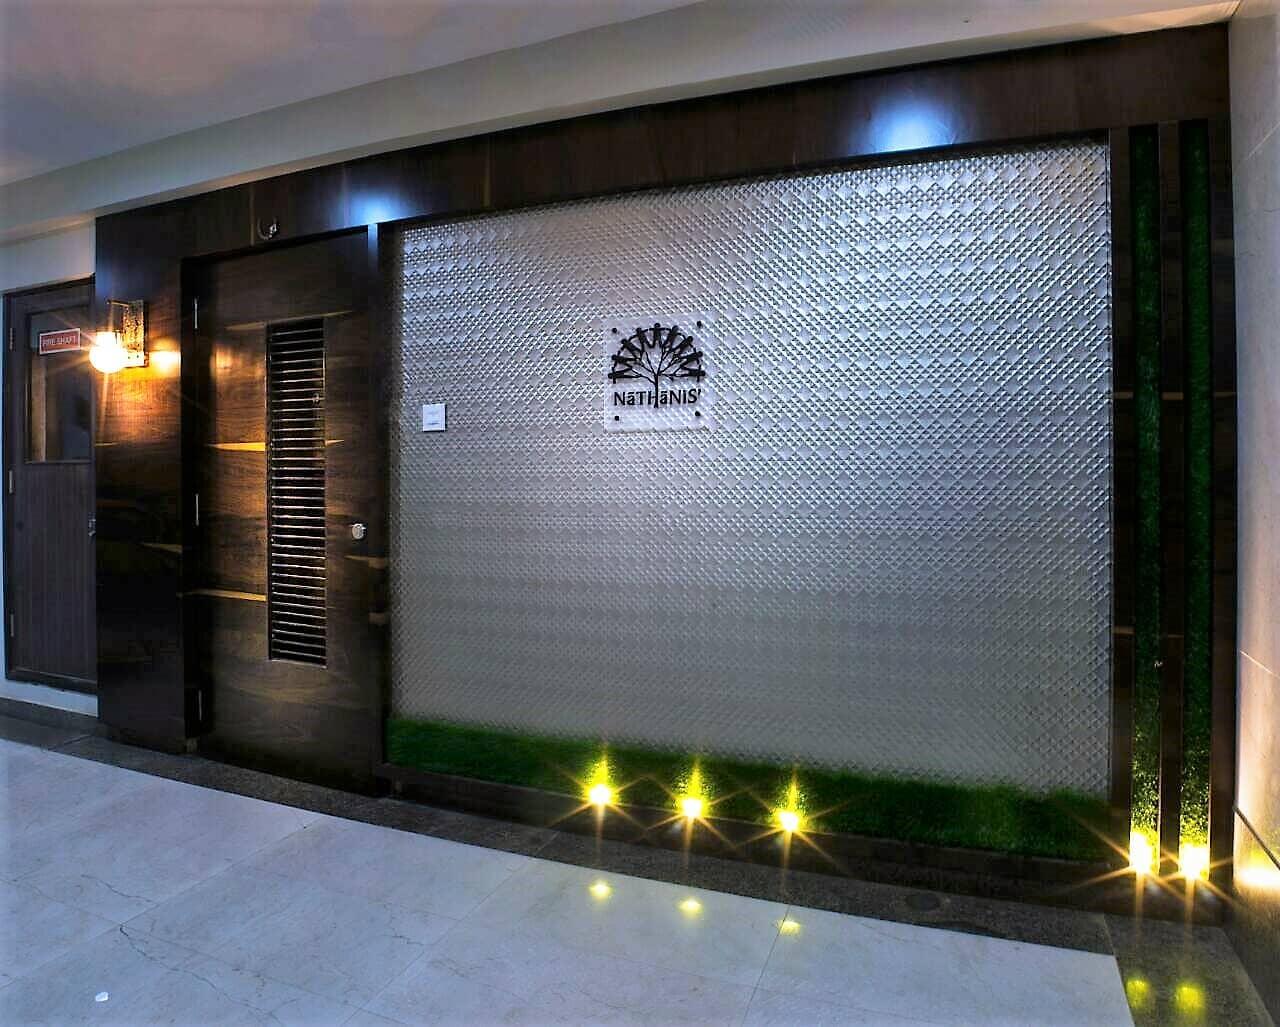 3BHK Premium Home, Mumbai